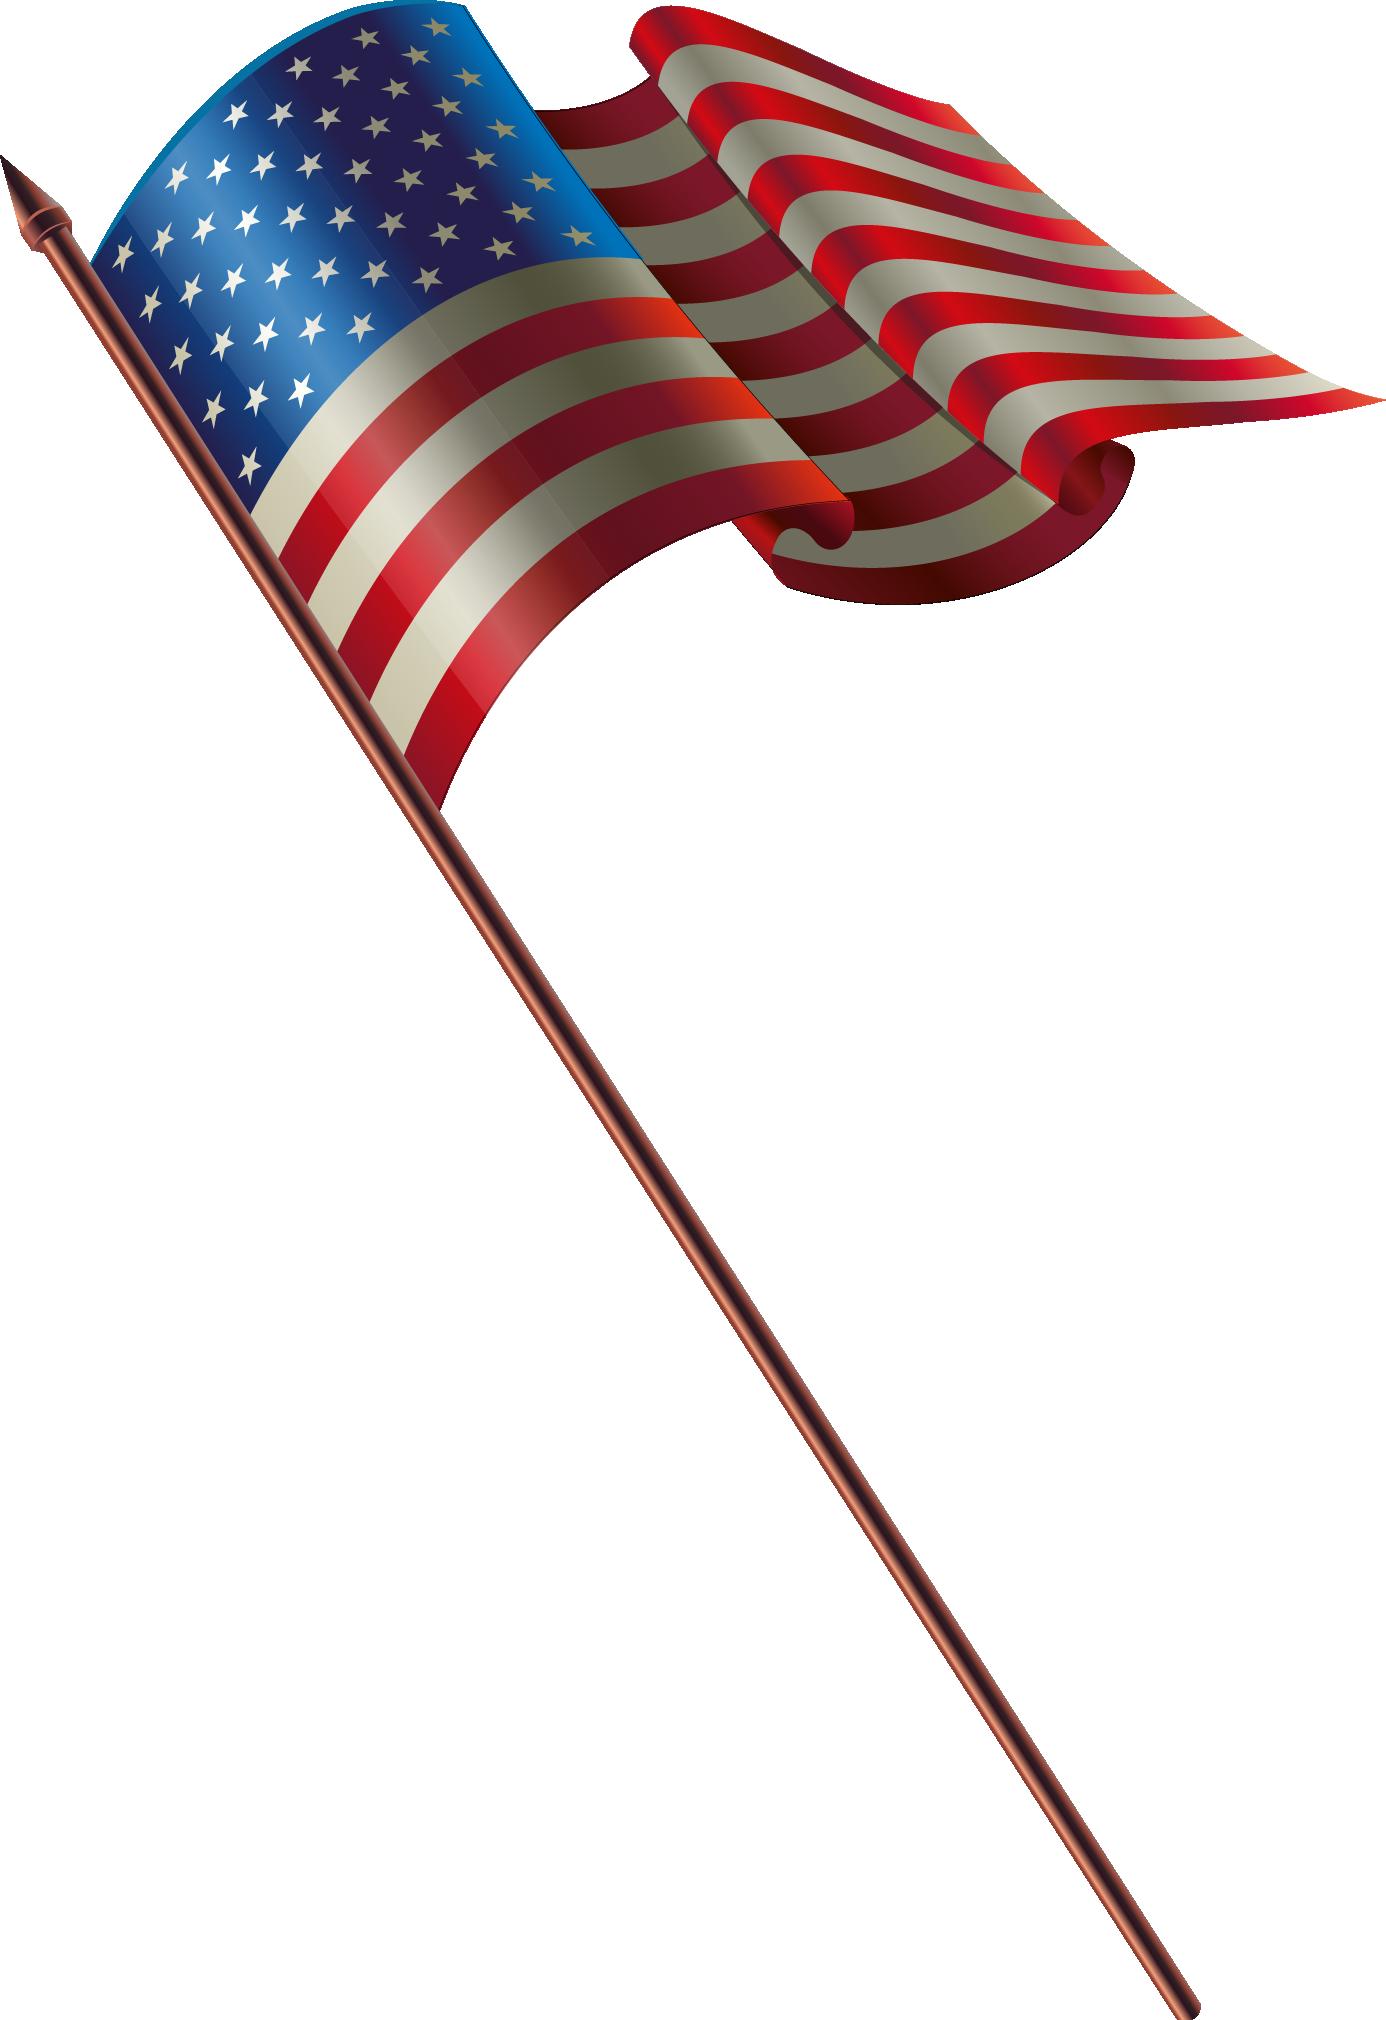 America Clipart American Freedom.